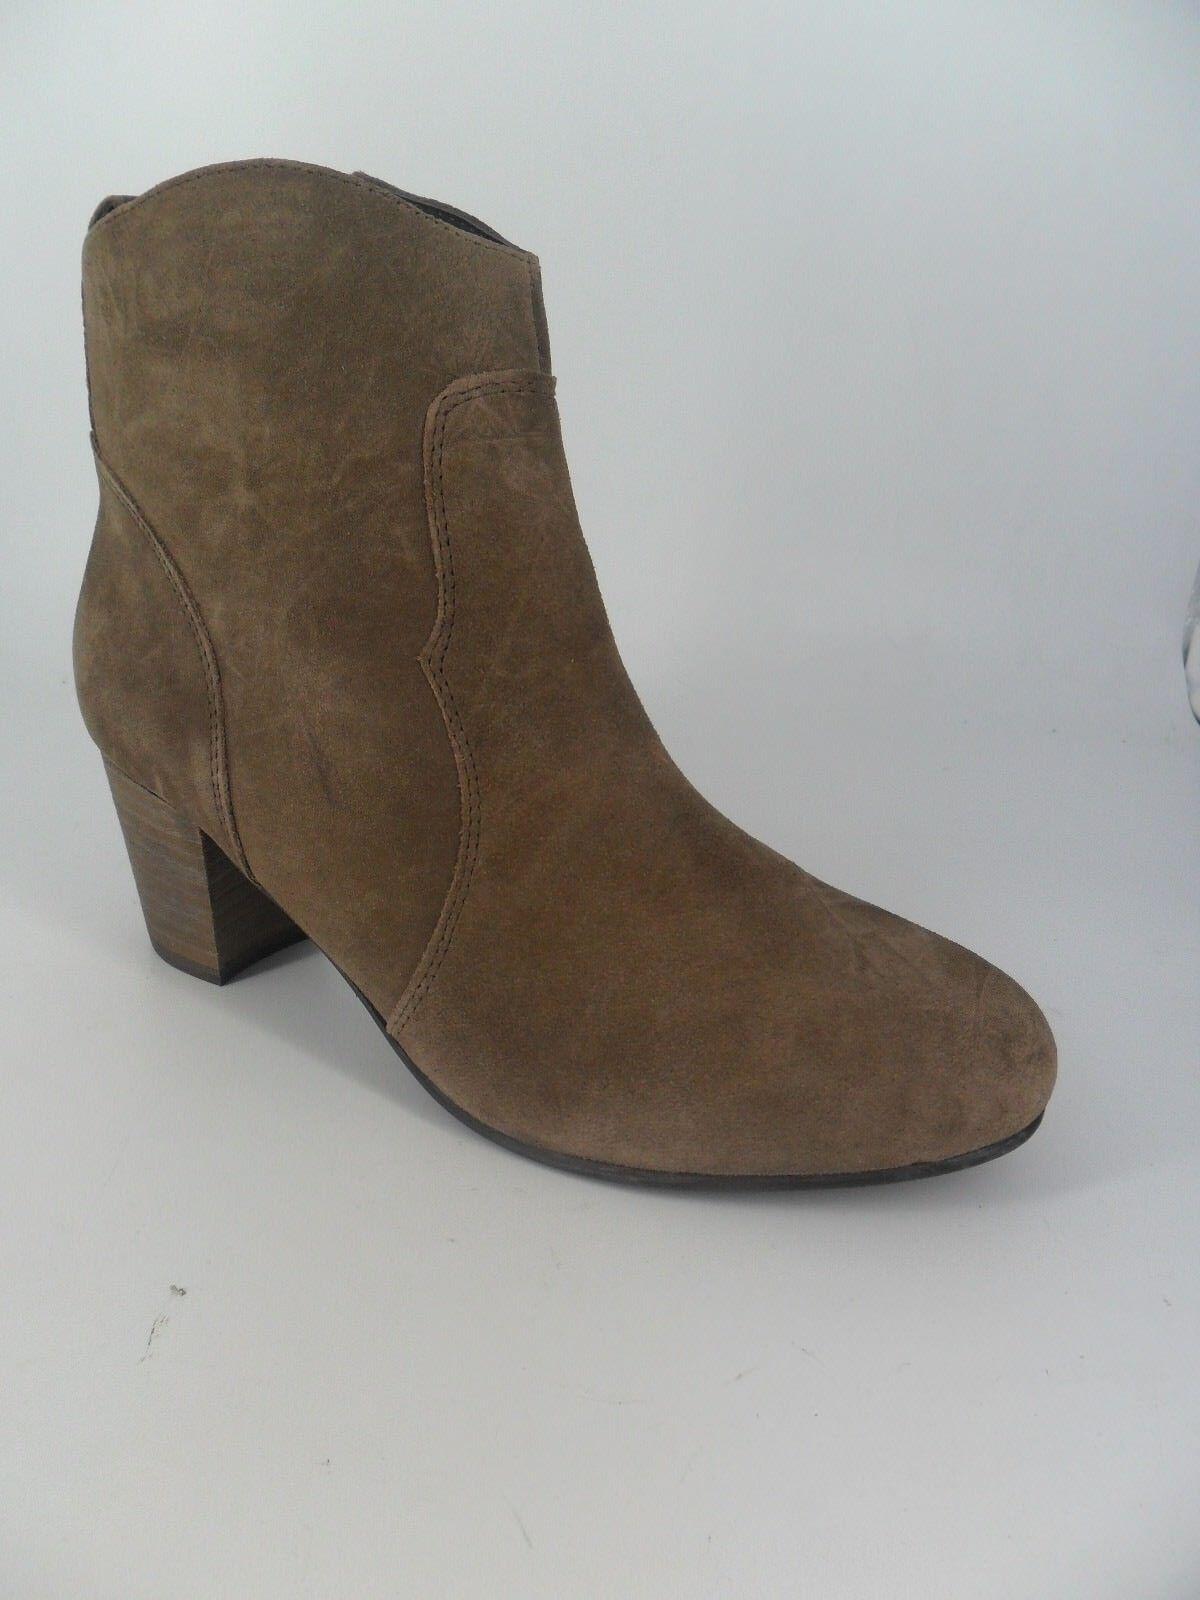 Next Ladie's Suede Ankle Stiefel's braun Größe UK 6 EU 39 NH087 PP 06